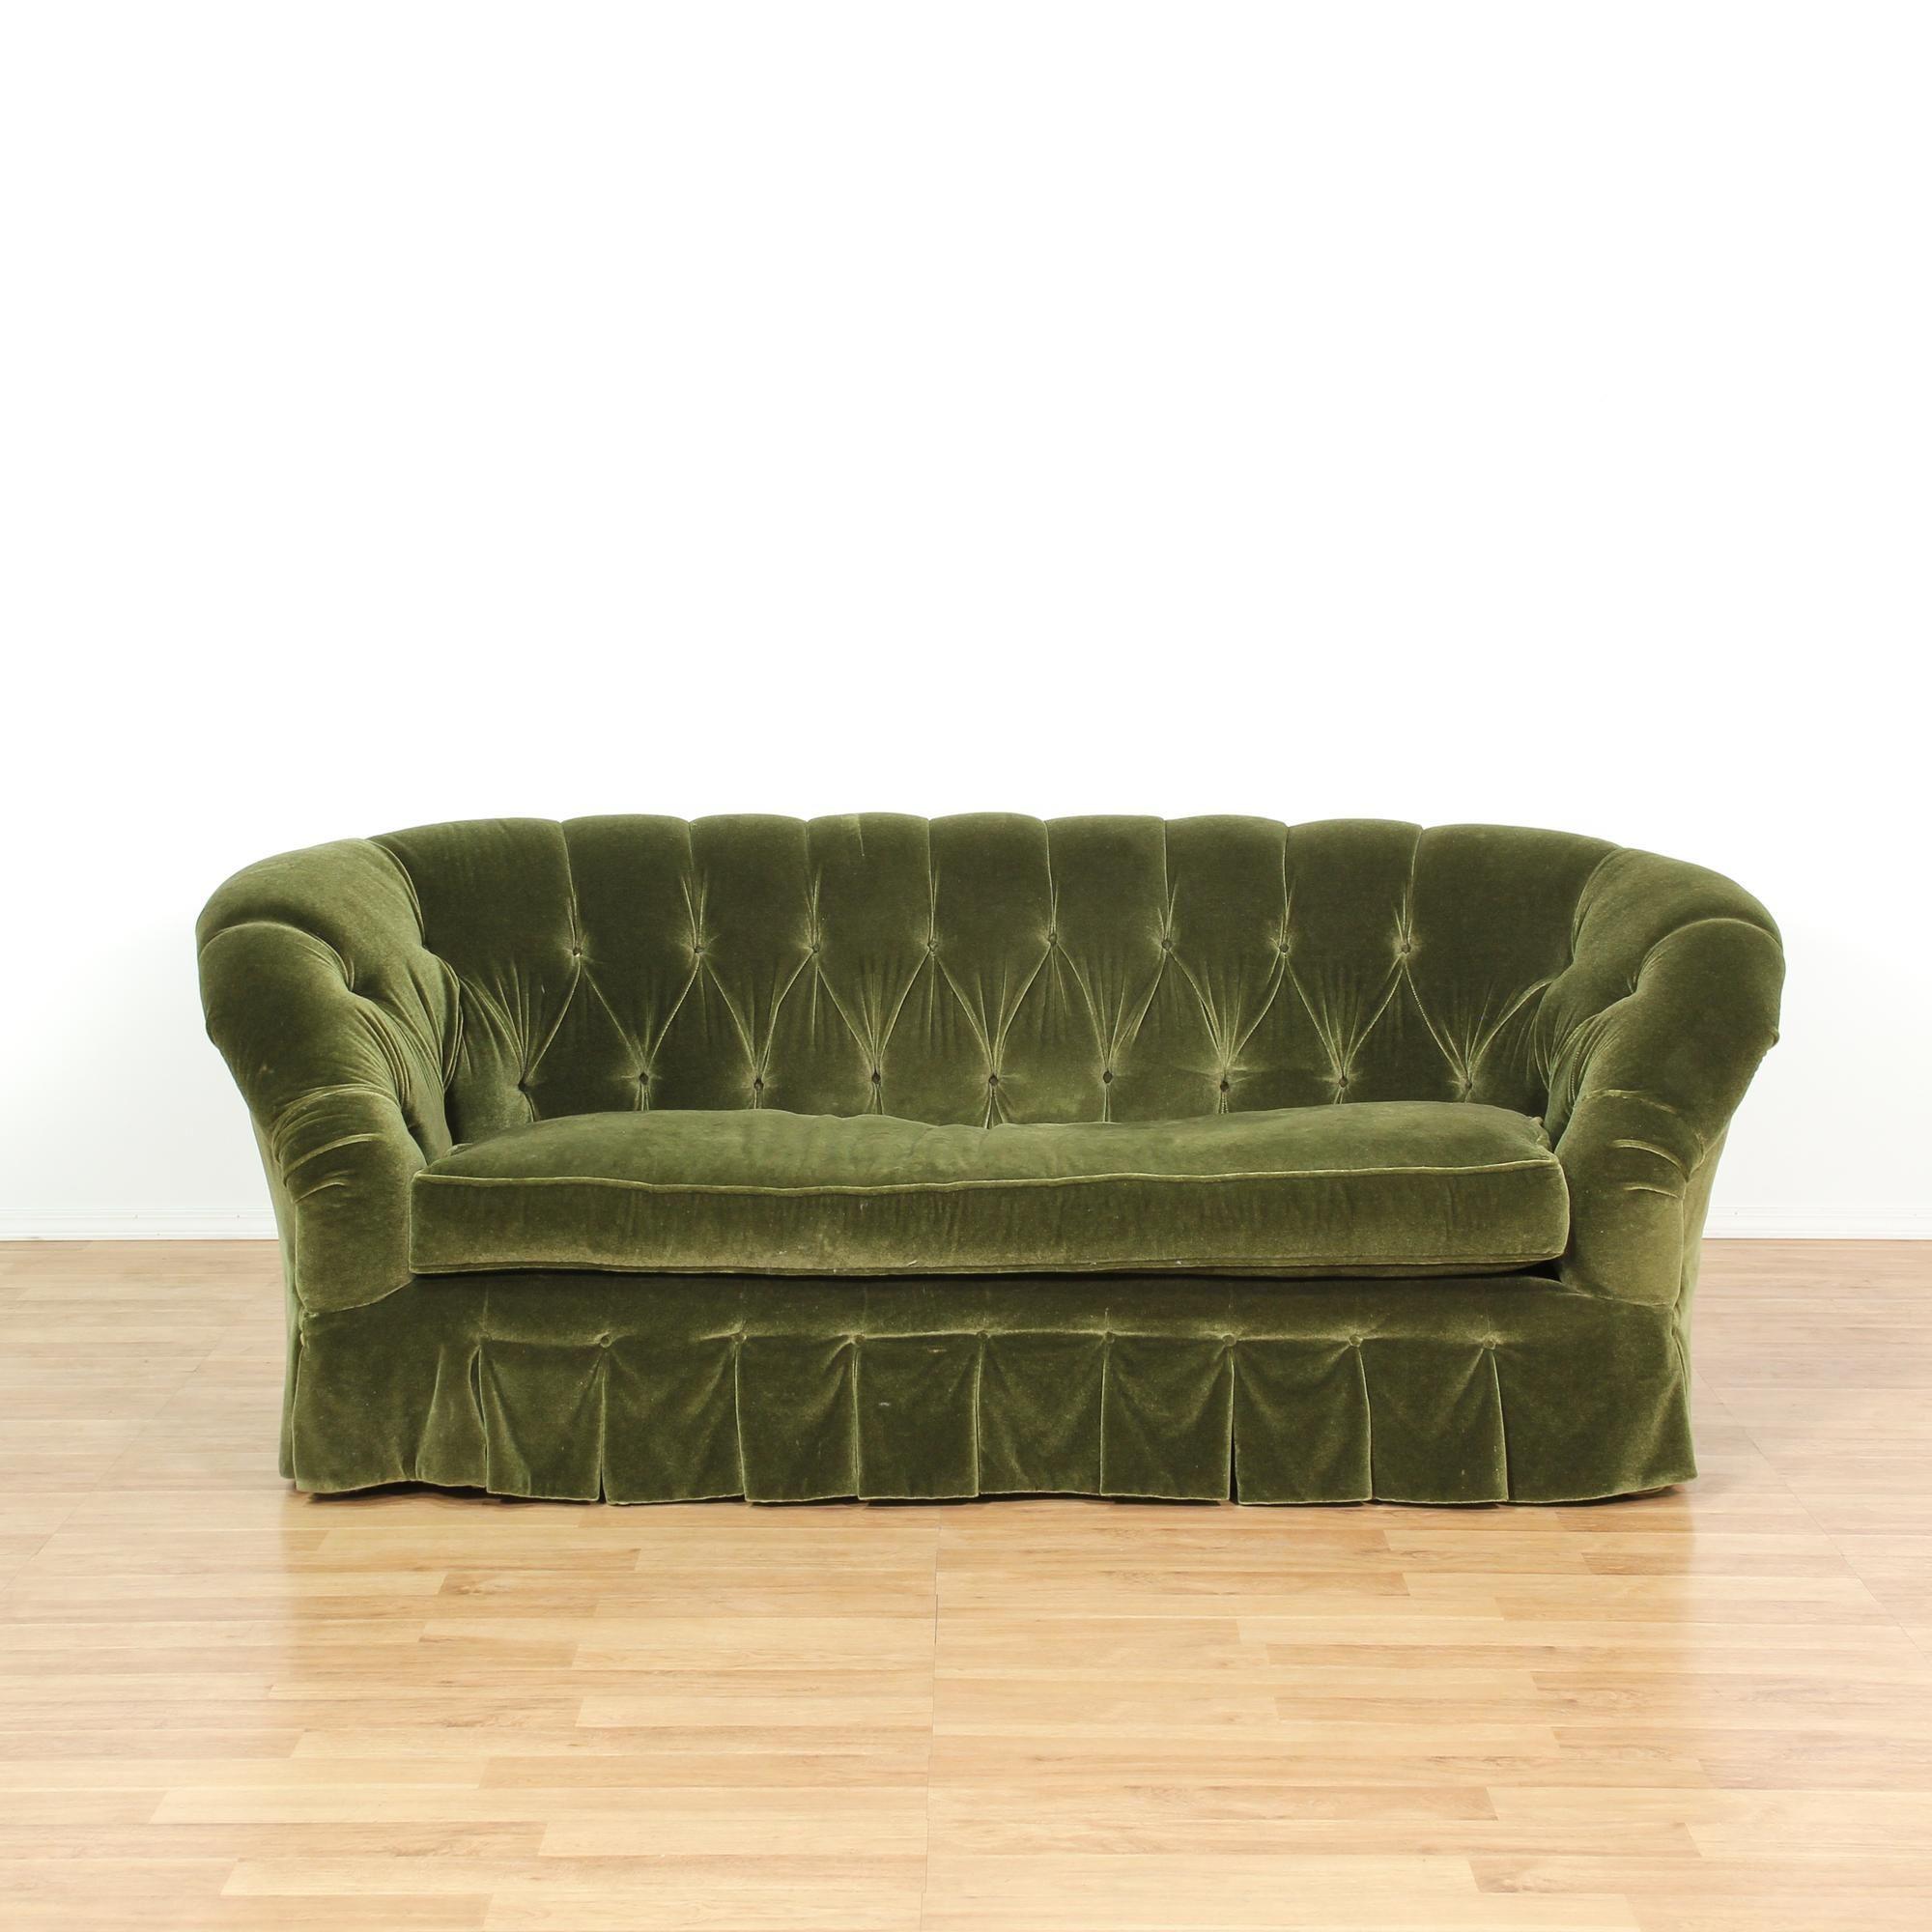 Green Cut Velvet Tufted Sofa | Loveseat Vintage Furniture San Diego U0026 Los  Angeles